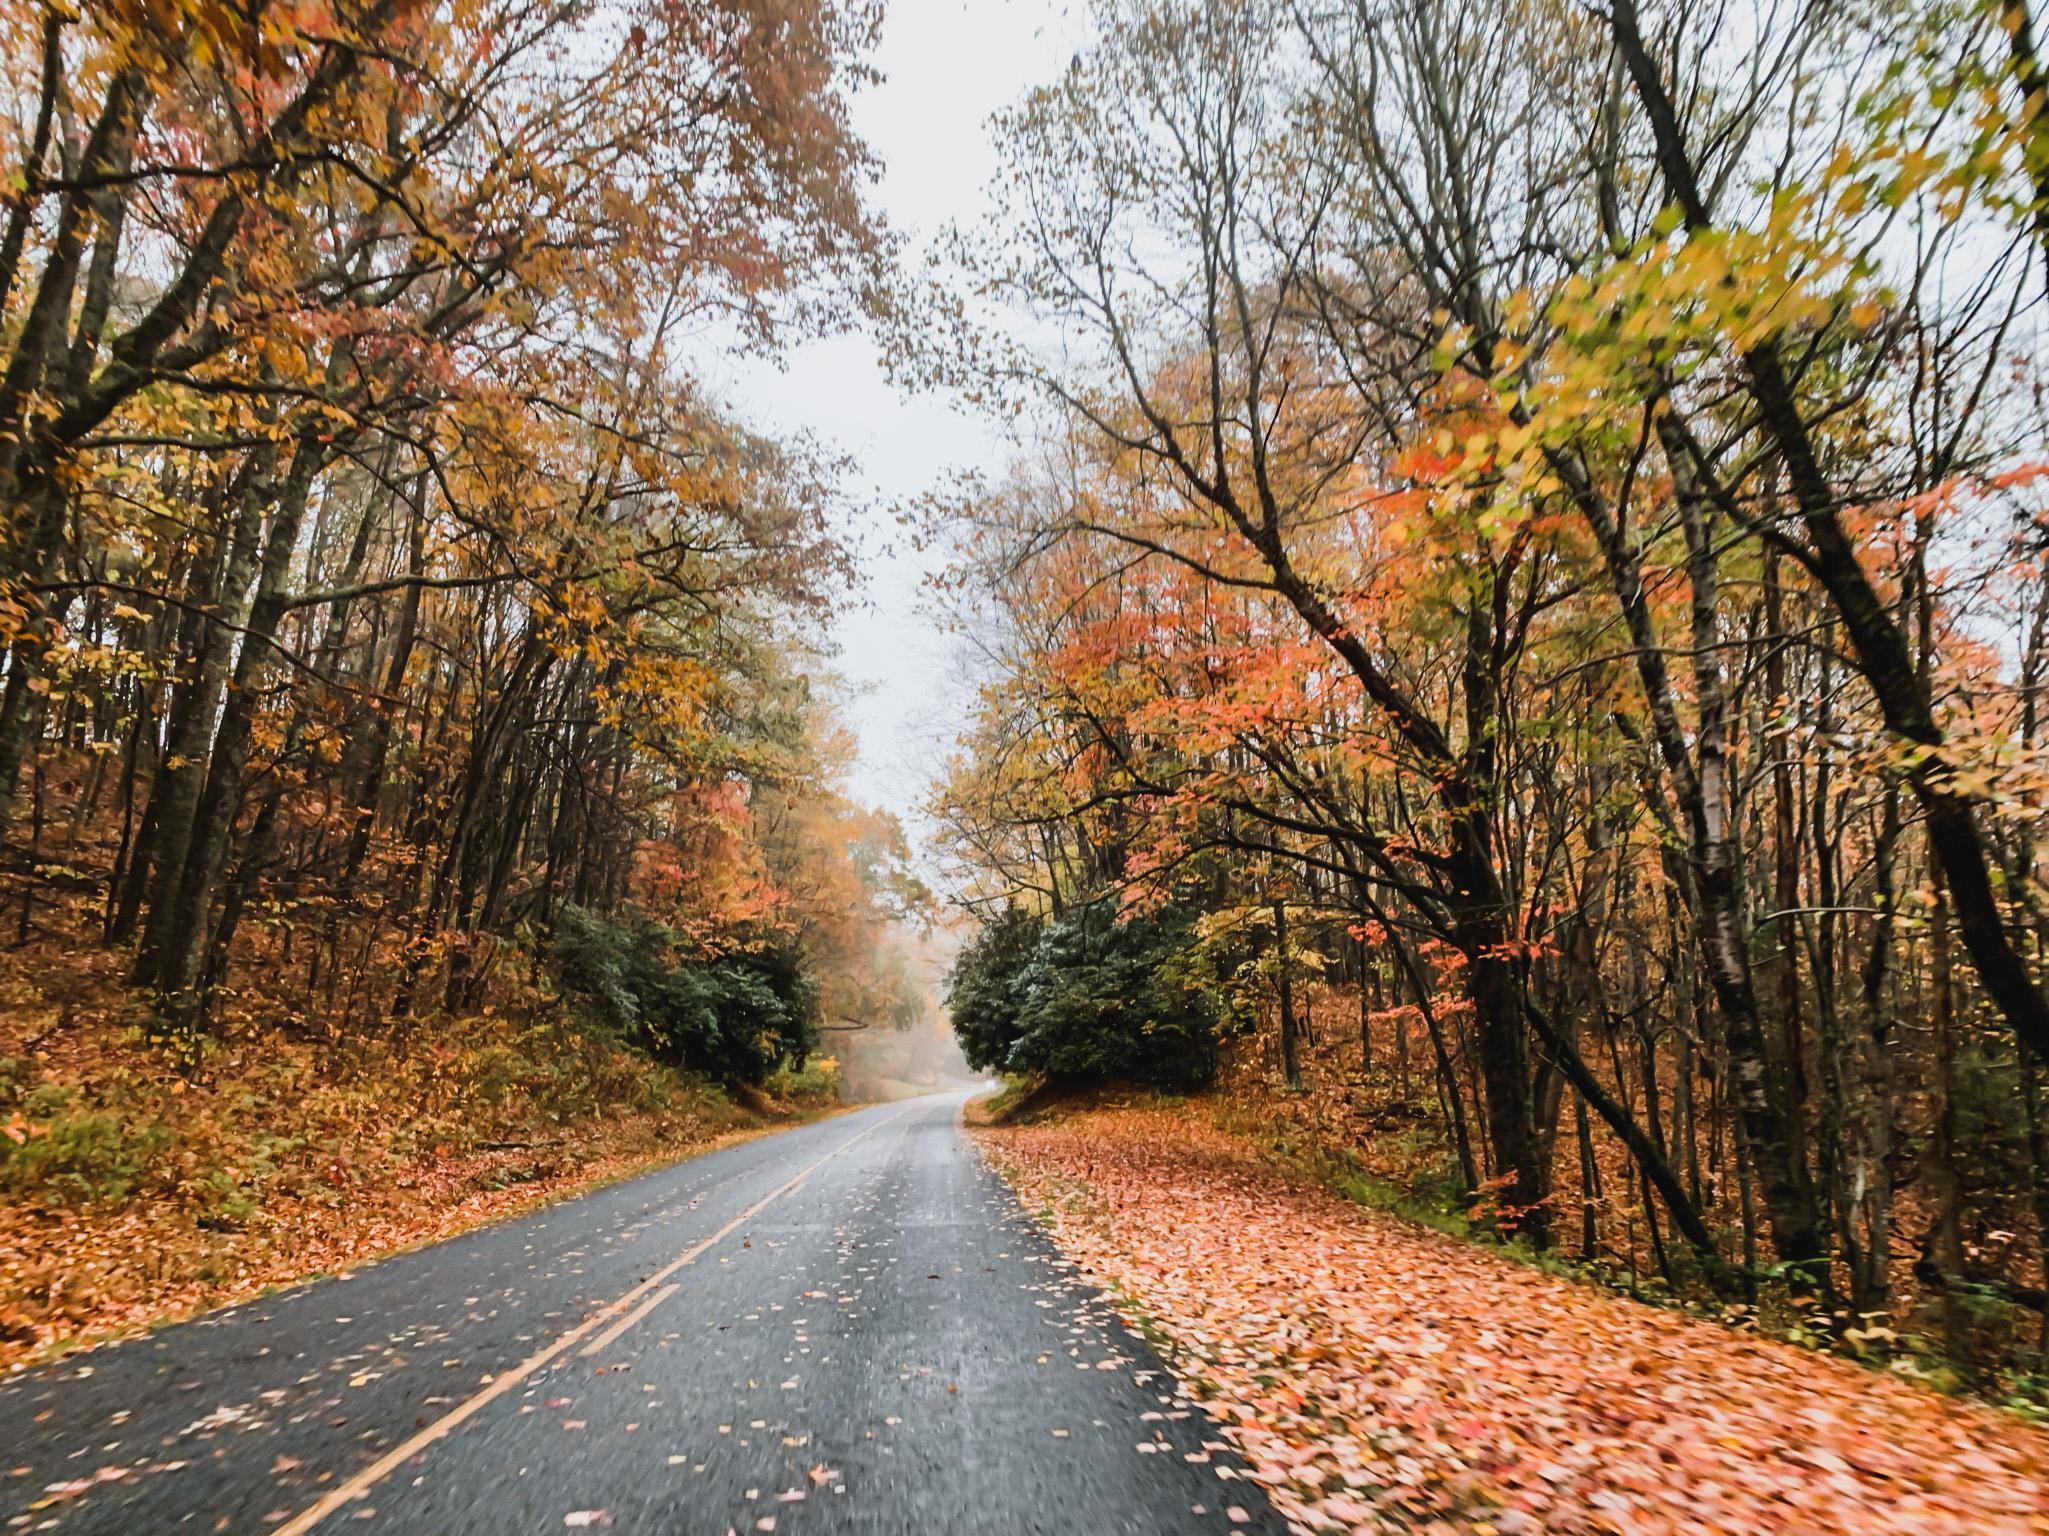 blue ridge parkway scenic drive